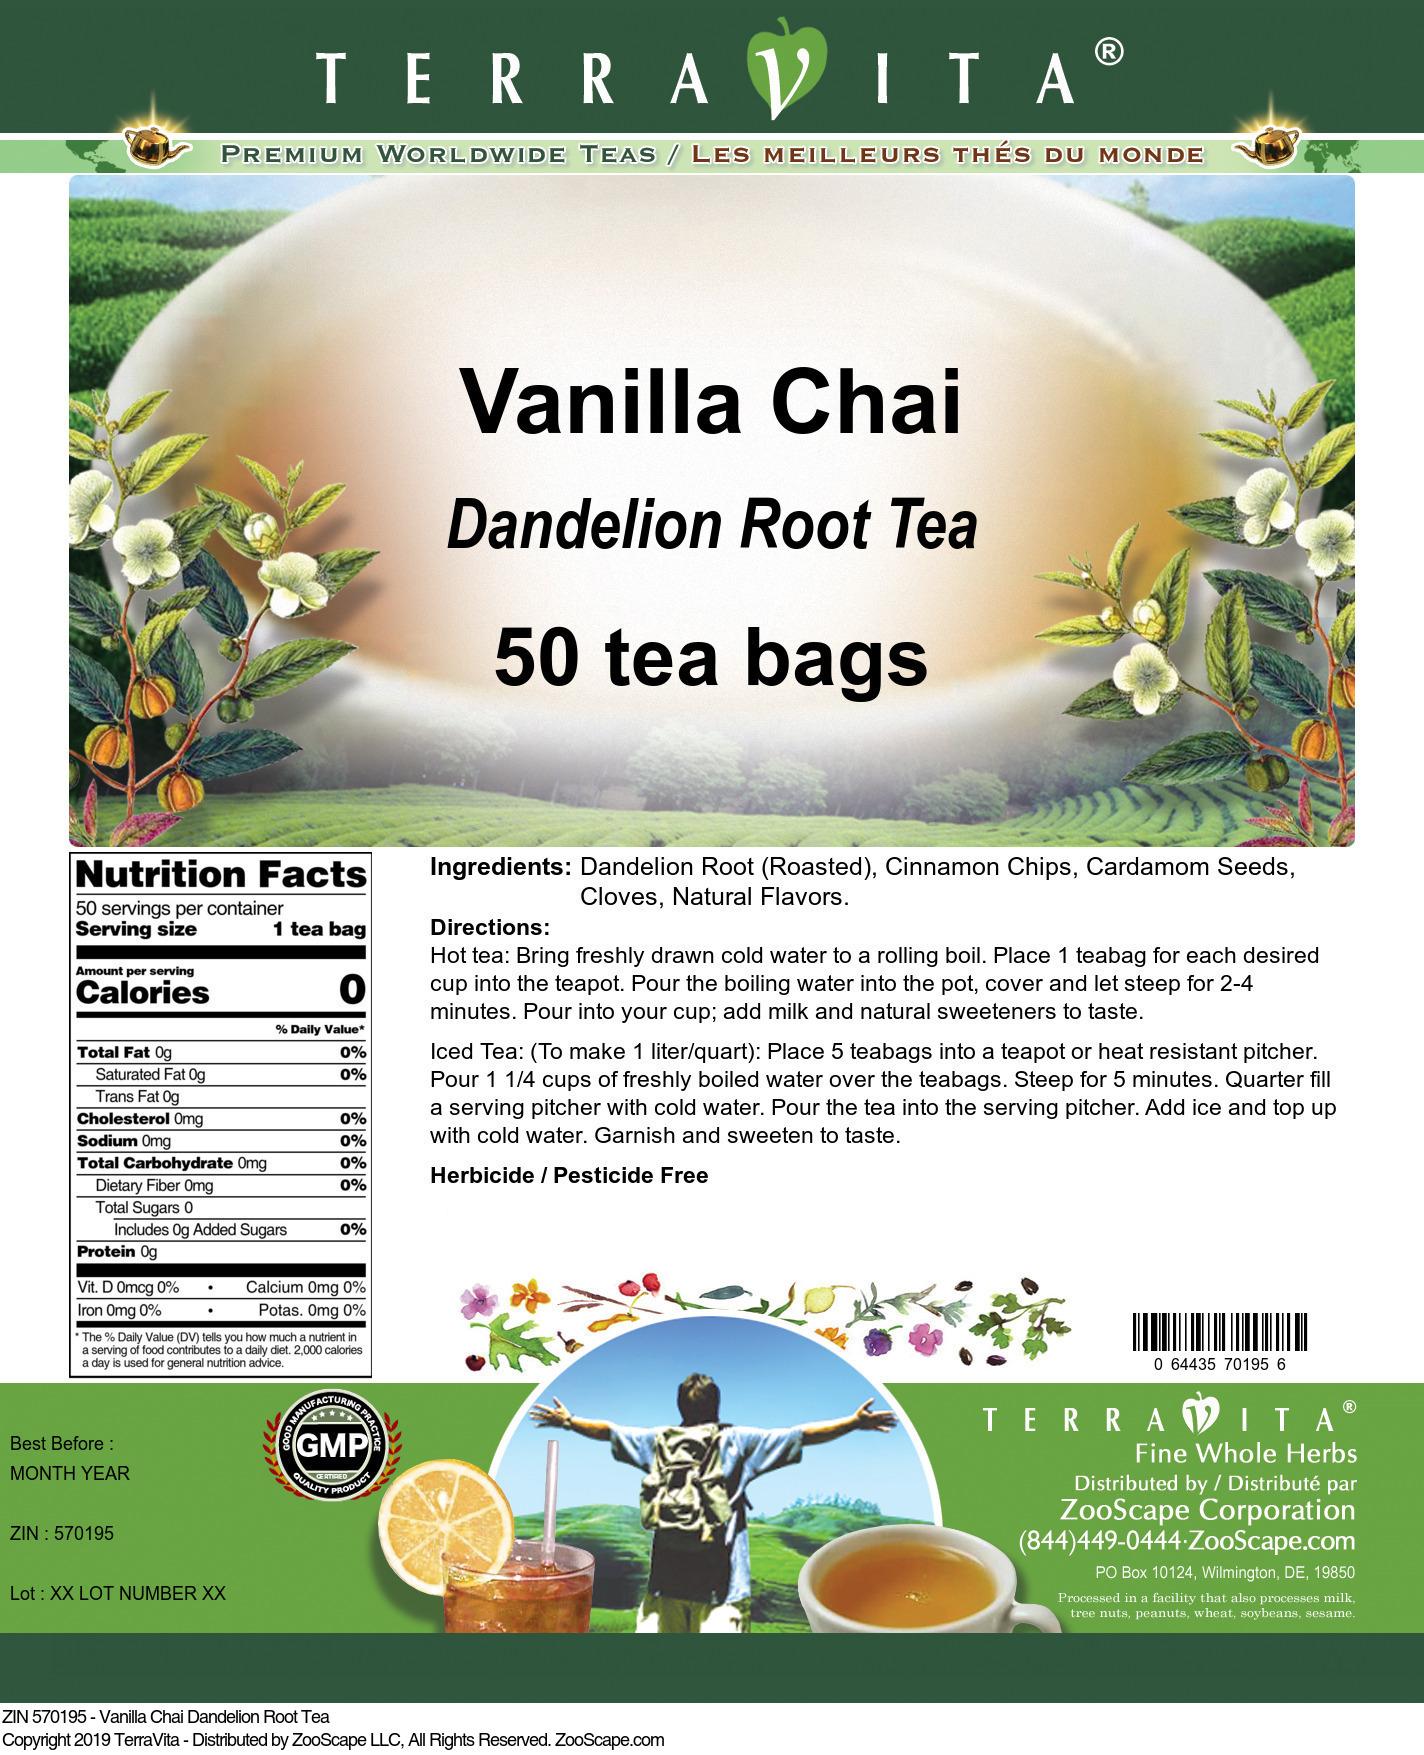 Vanilla Chai Dandelion Root Tea